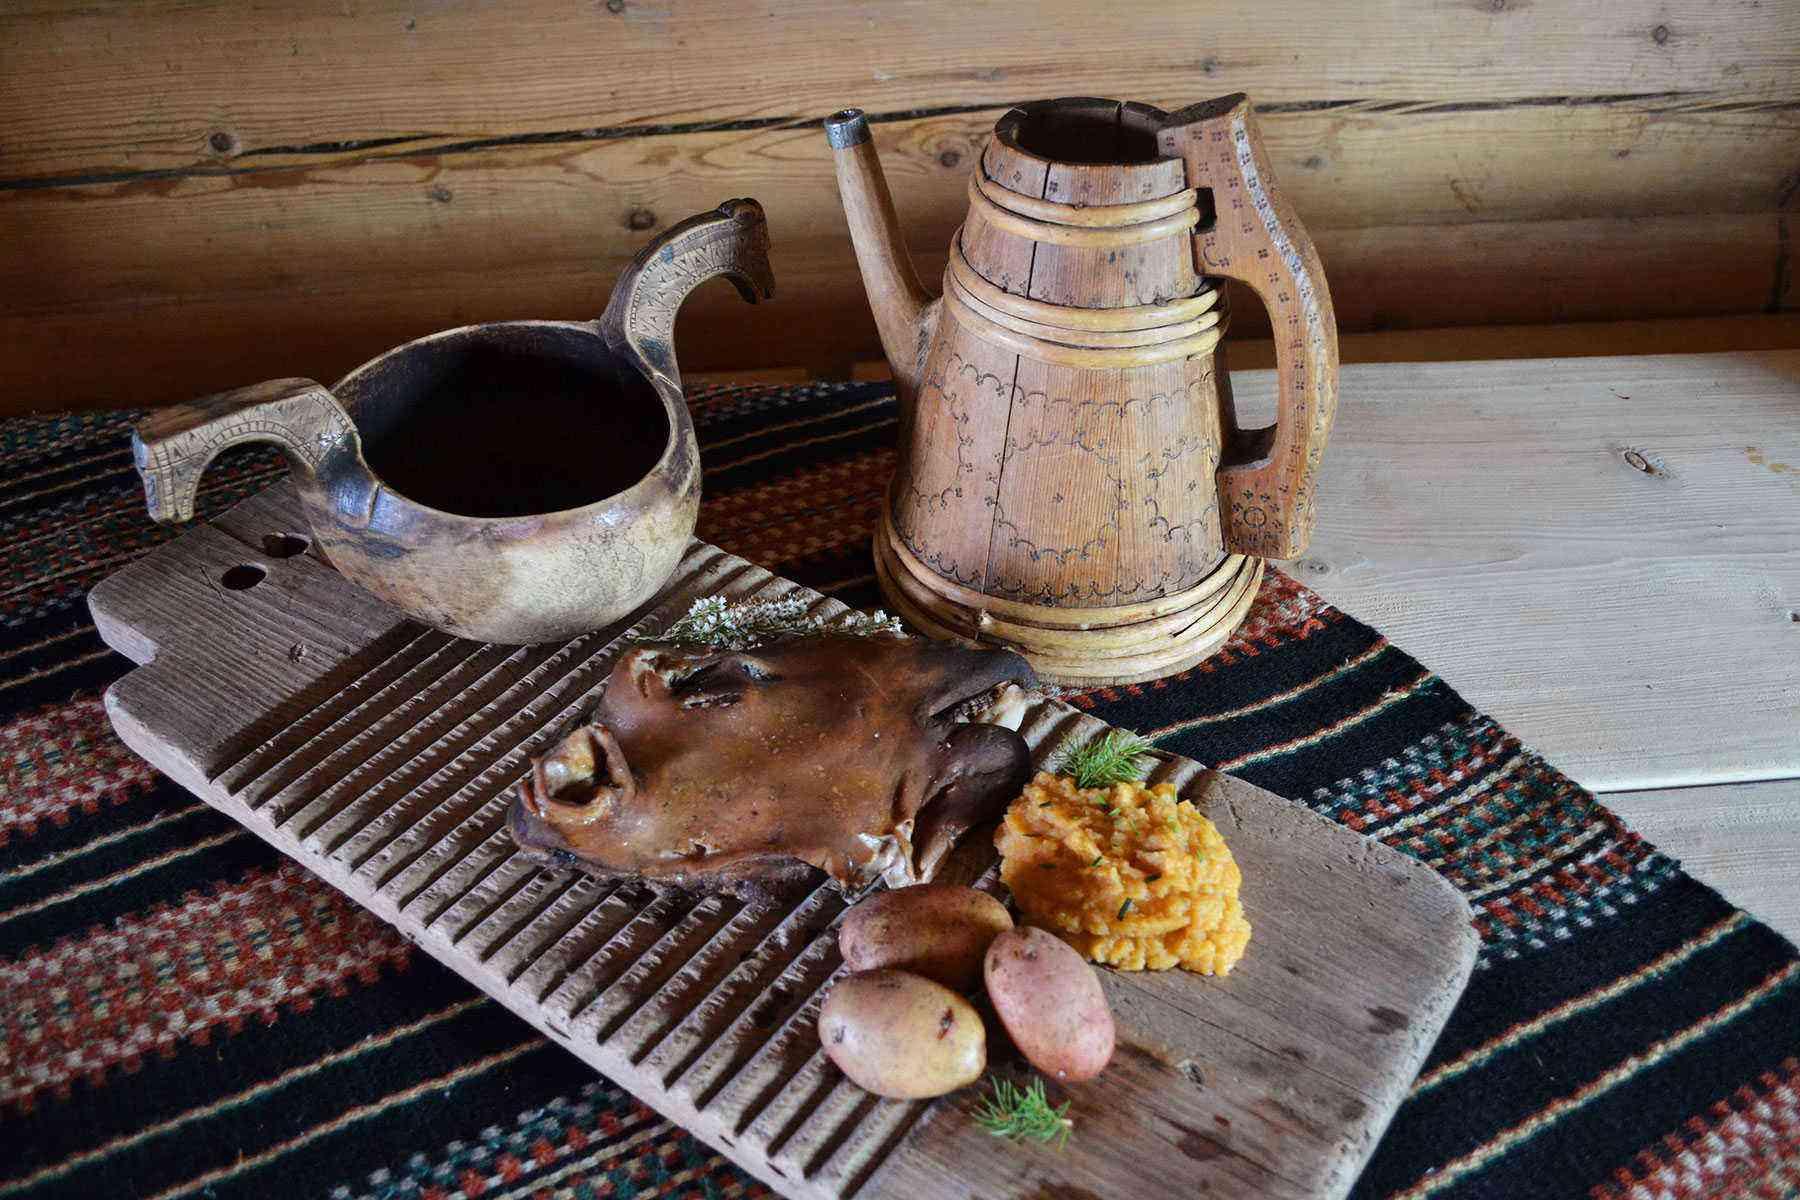 Fall-Food-Festivals-Smalahovetunet